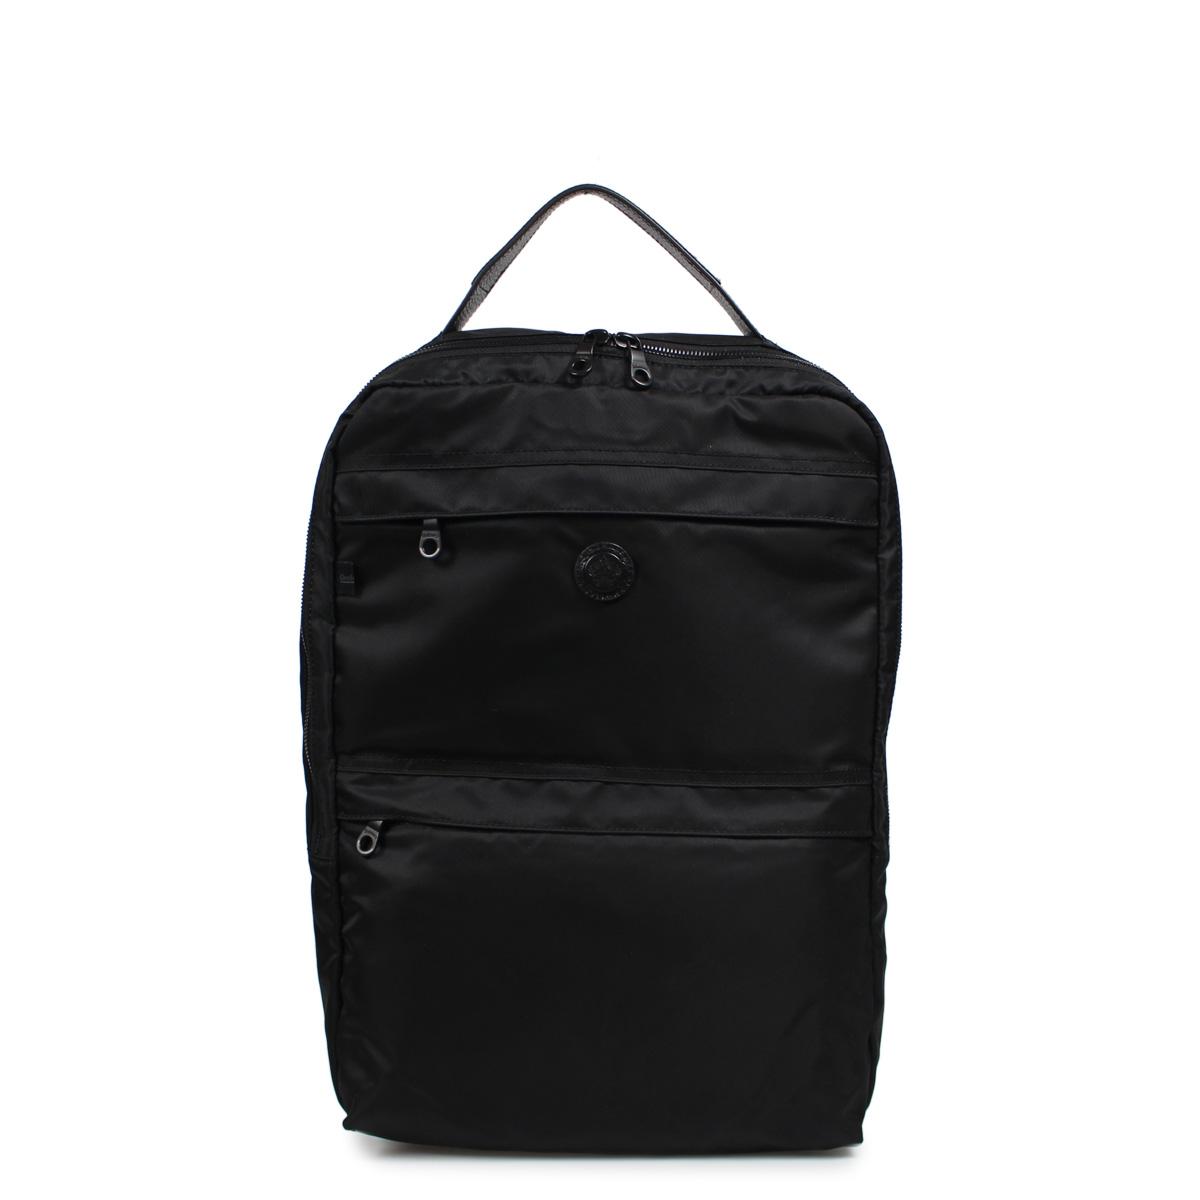 Orobianco PUNTUALE-G ALL BLACK オロビアンコ リュック バッグ バックパック メンズ ブラック 黒 92136